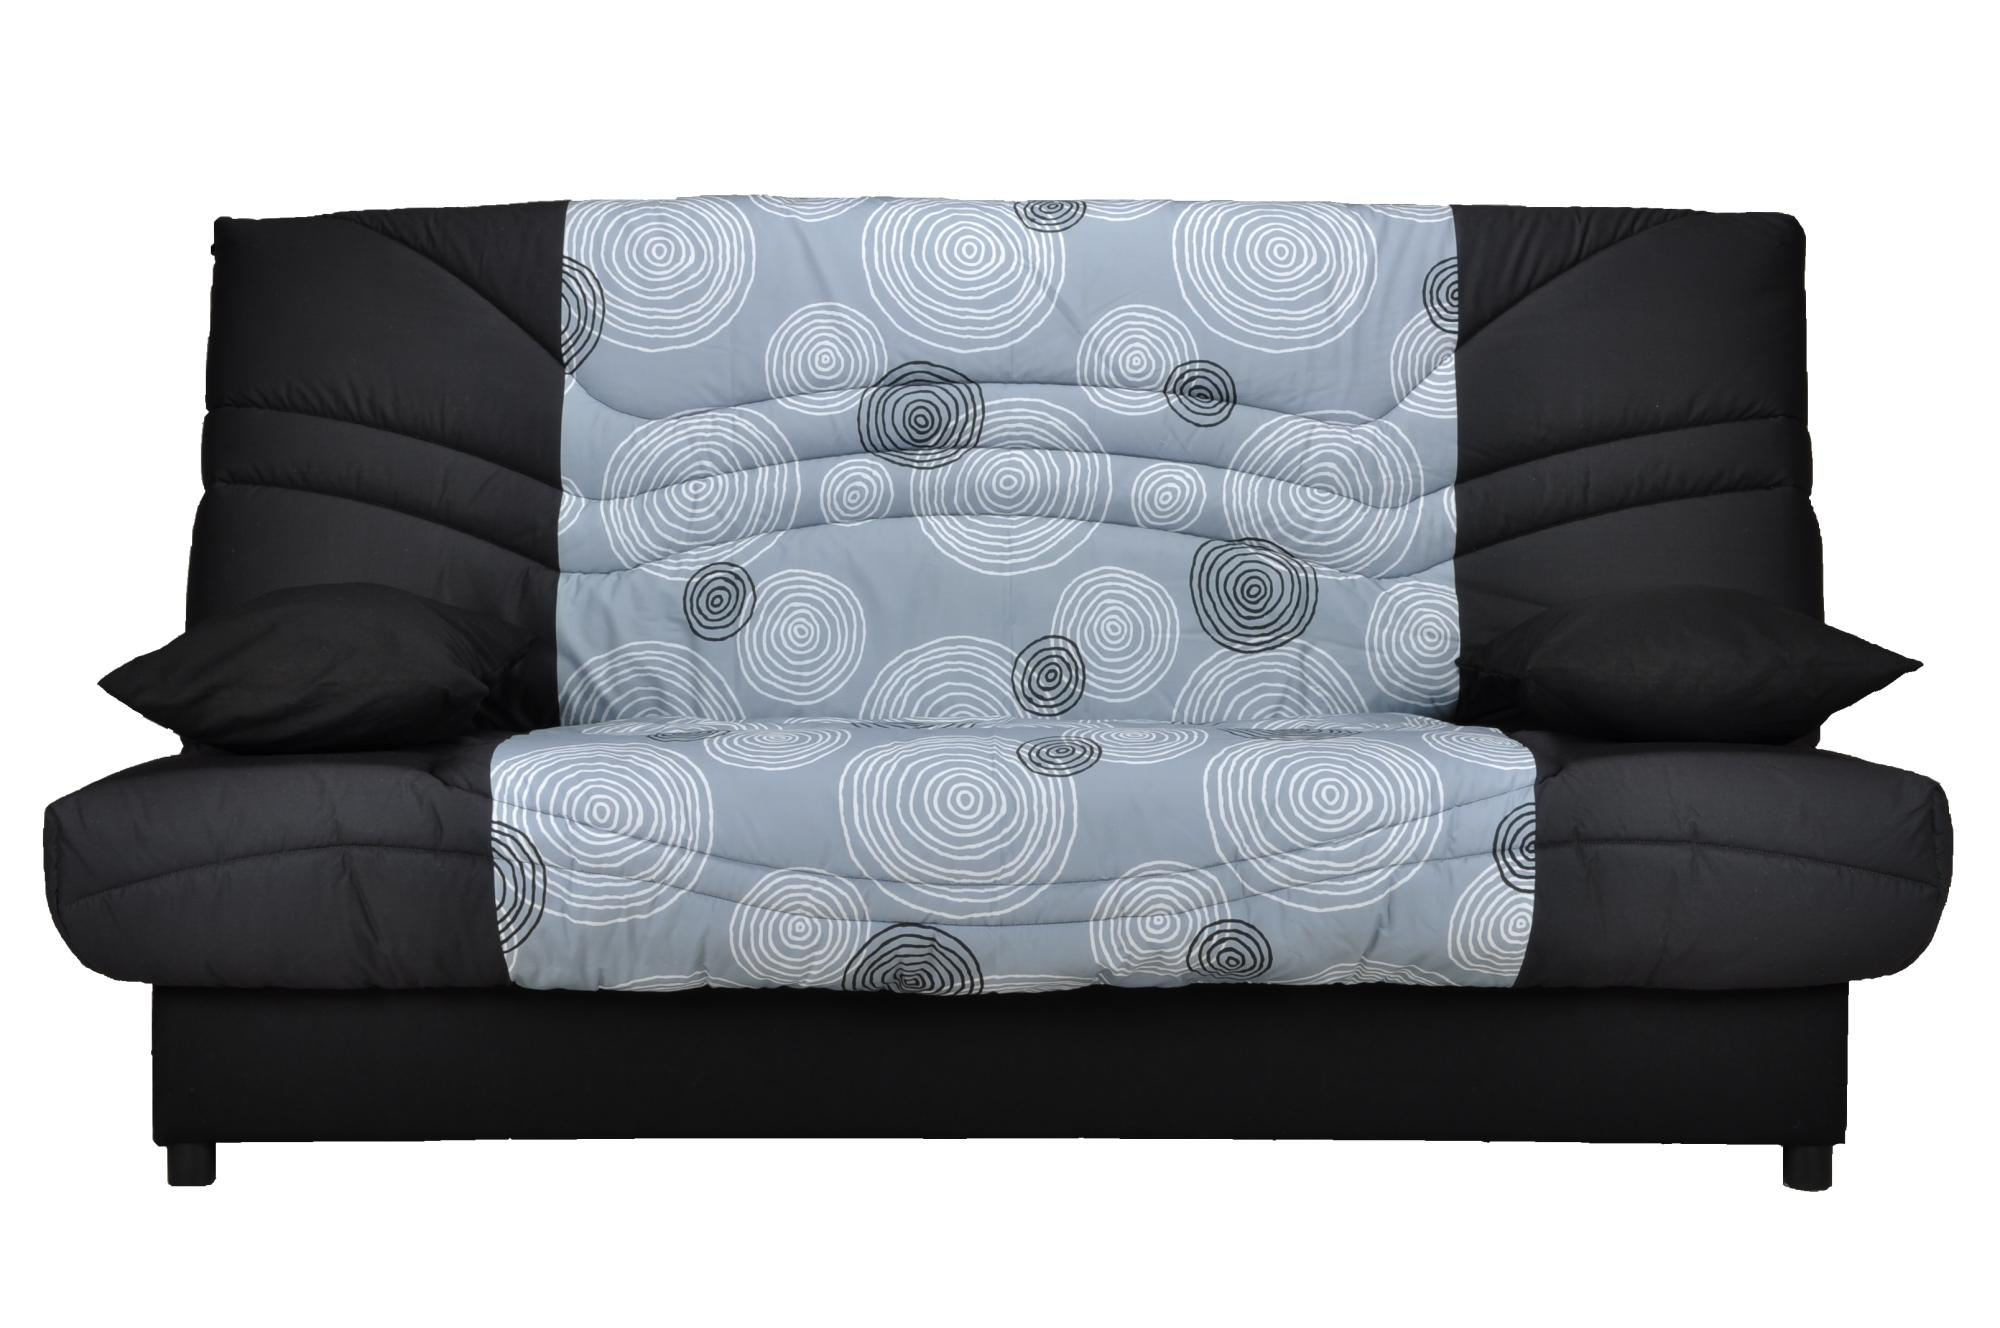 banquette clic clac elvire. Black Bedroom Furniture Sets. Home Design Ideas